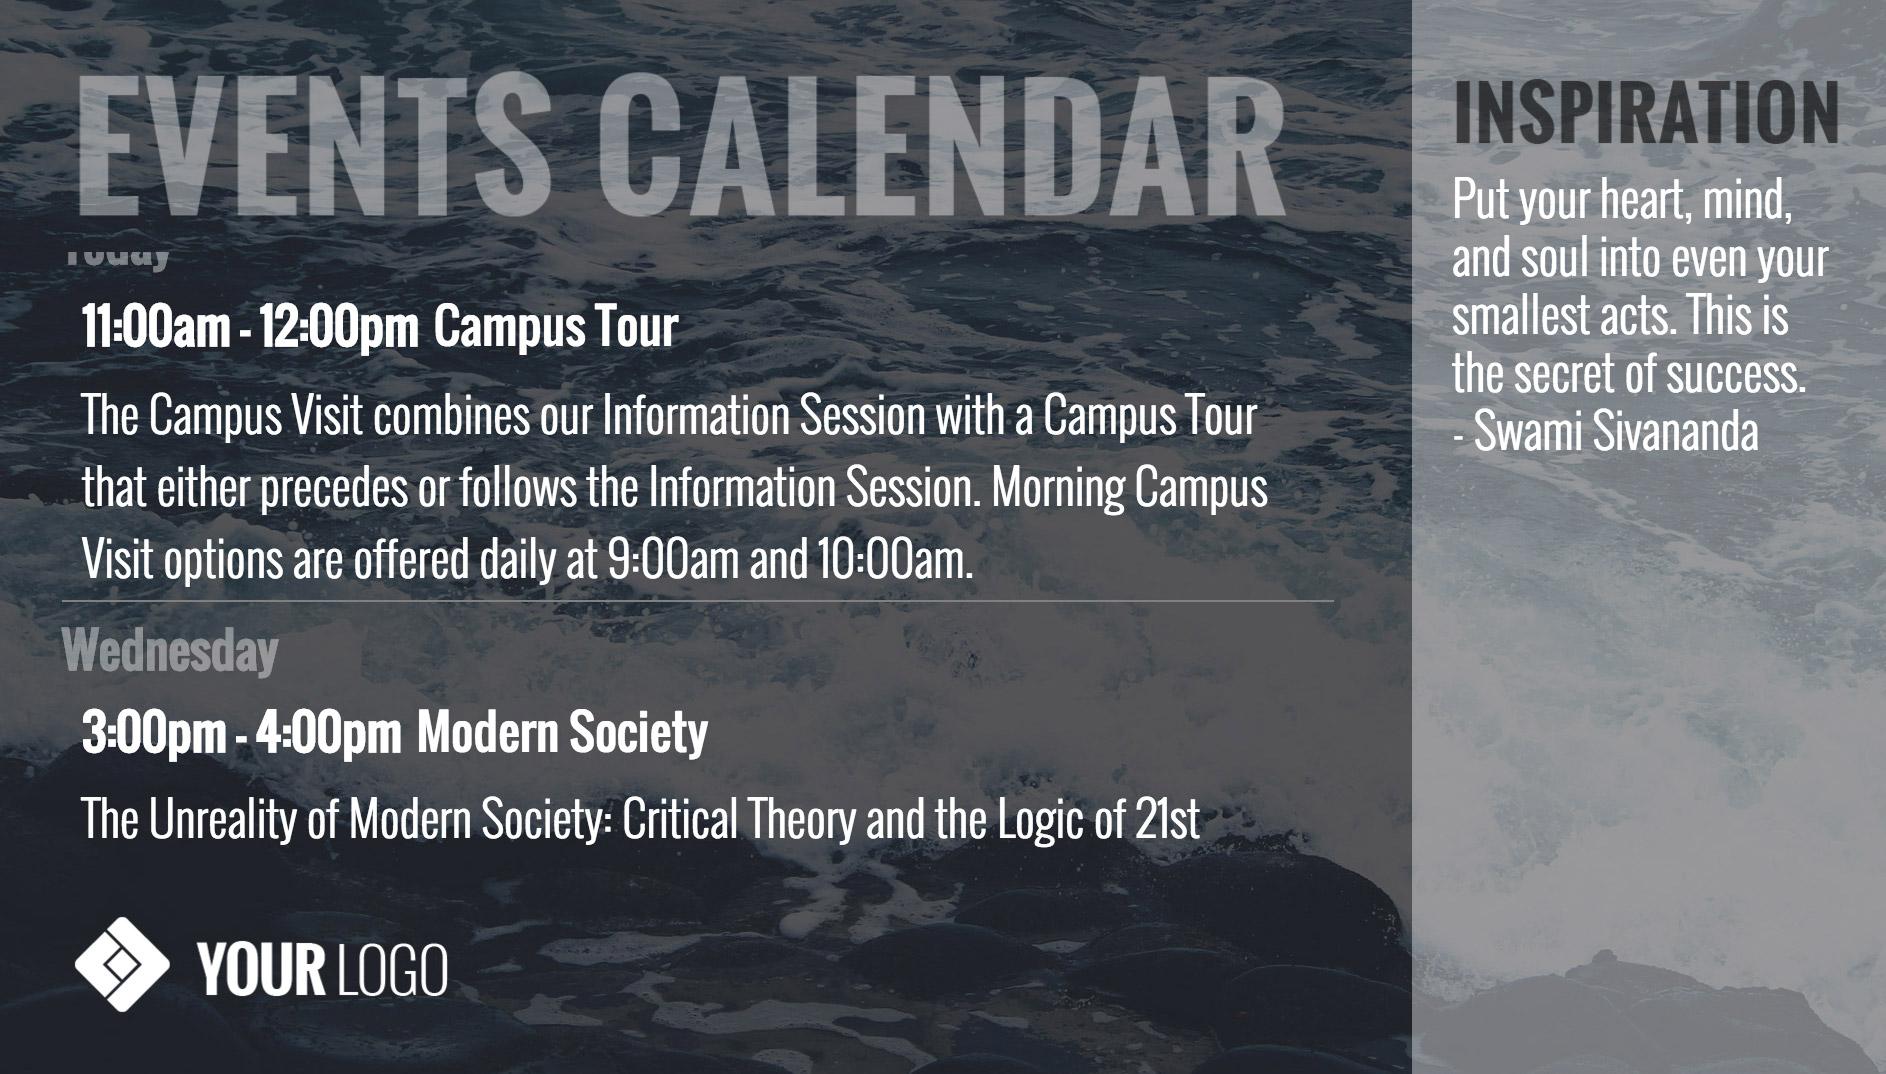 Events Calendar Digital Signage Template